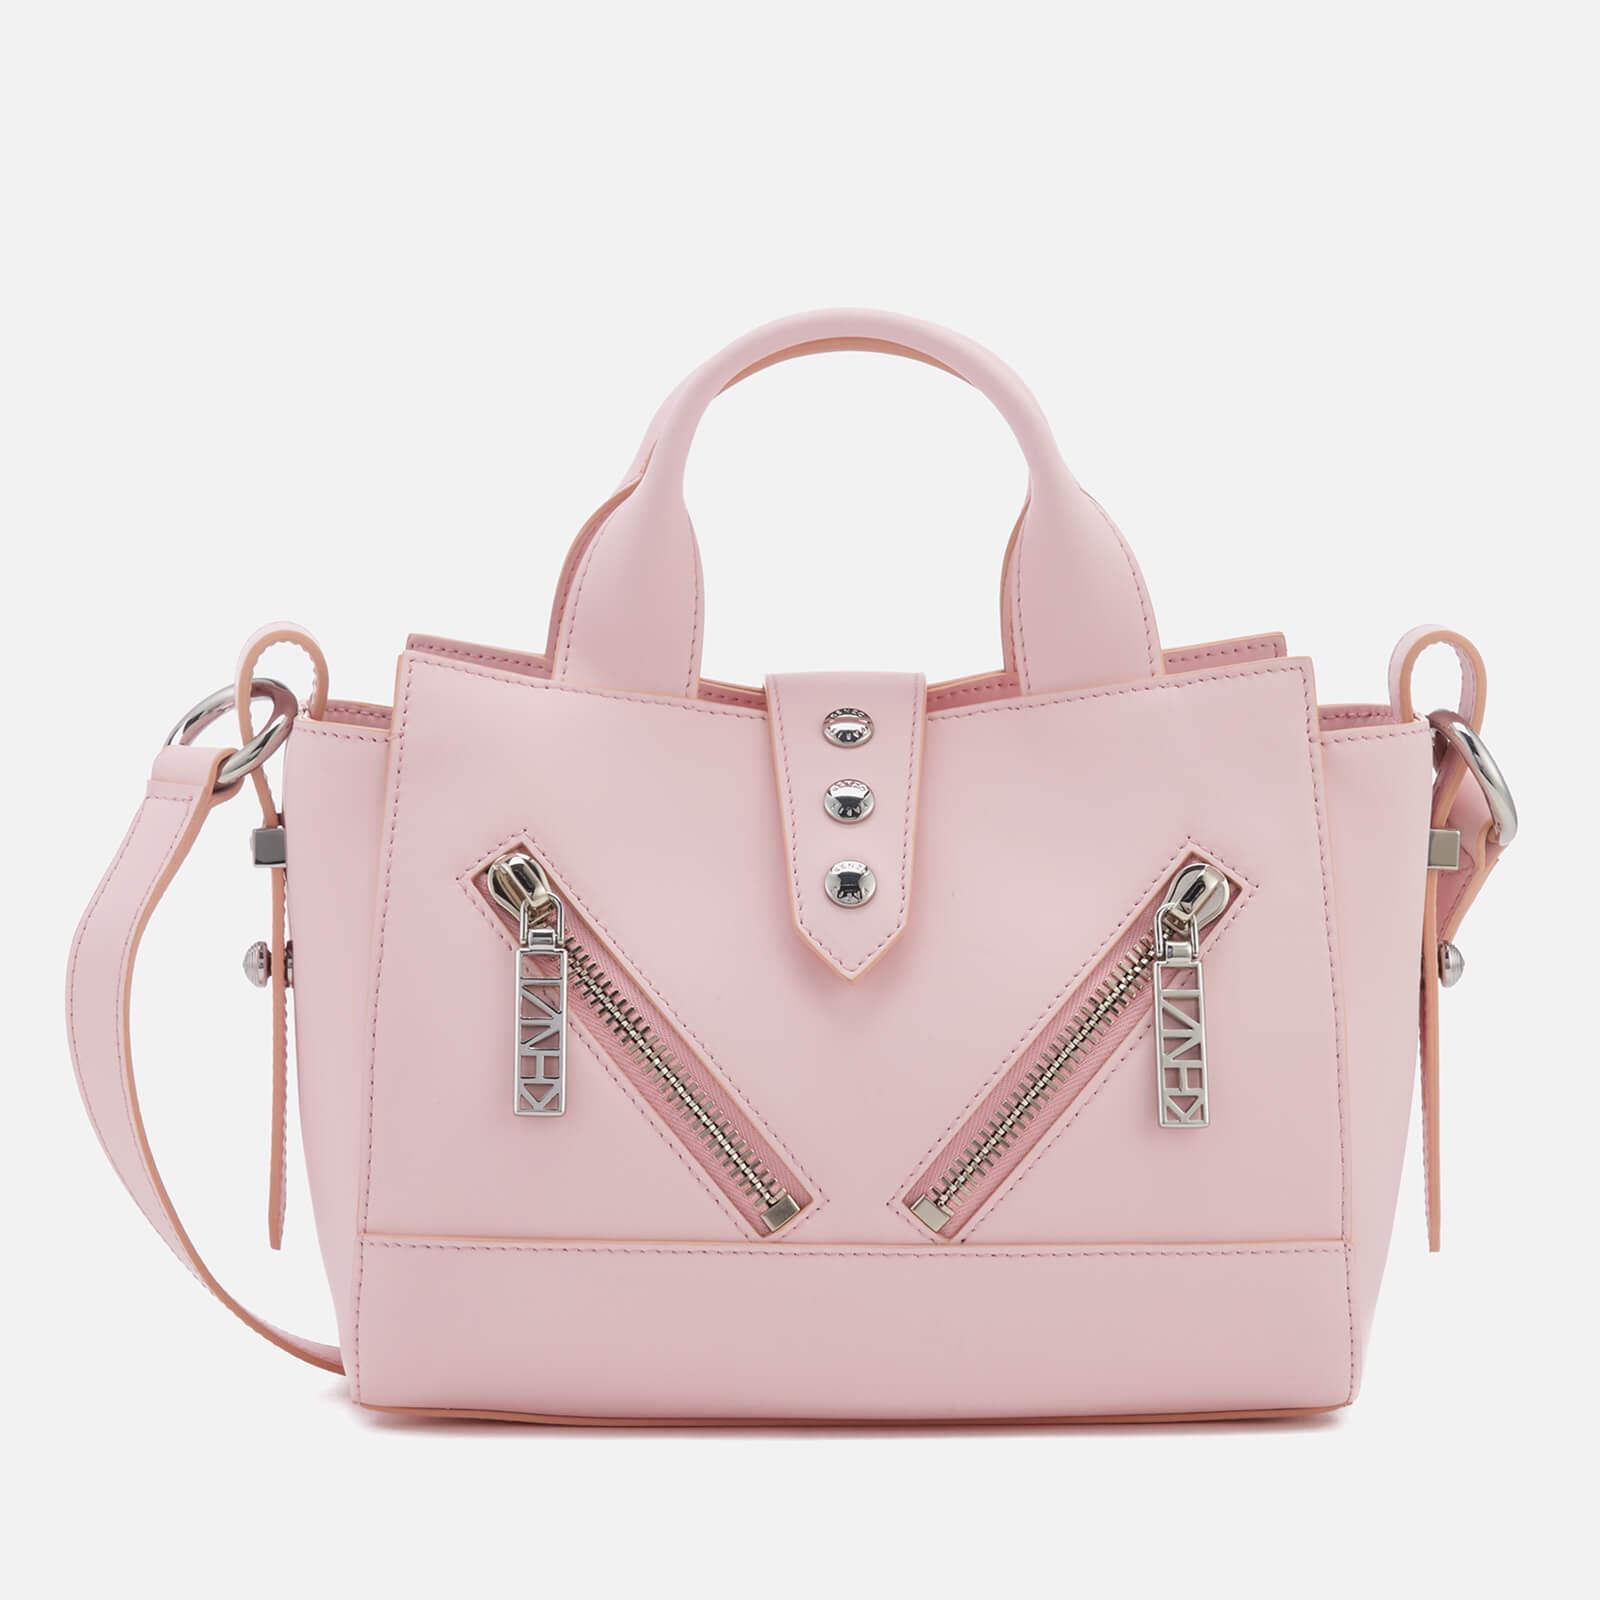 61b39b49 KENZO Women's Kalifornia Mini Tote Bag - Pink